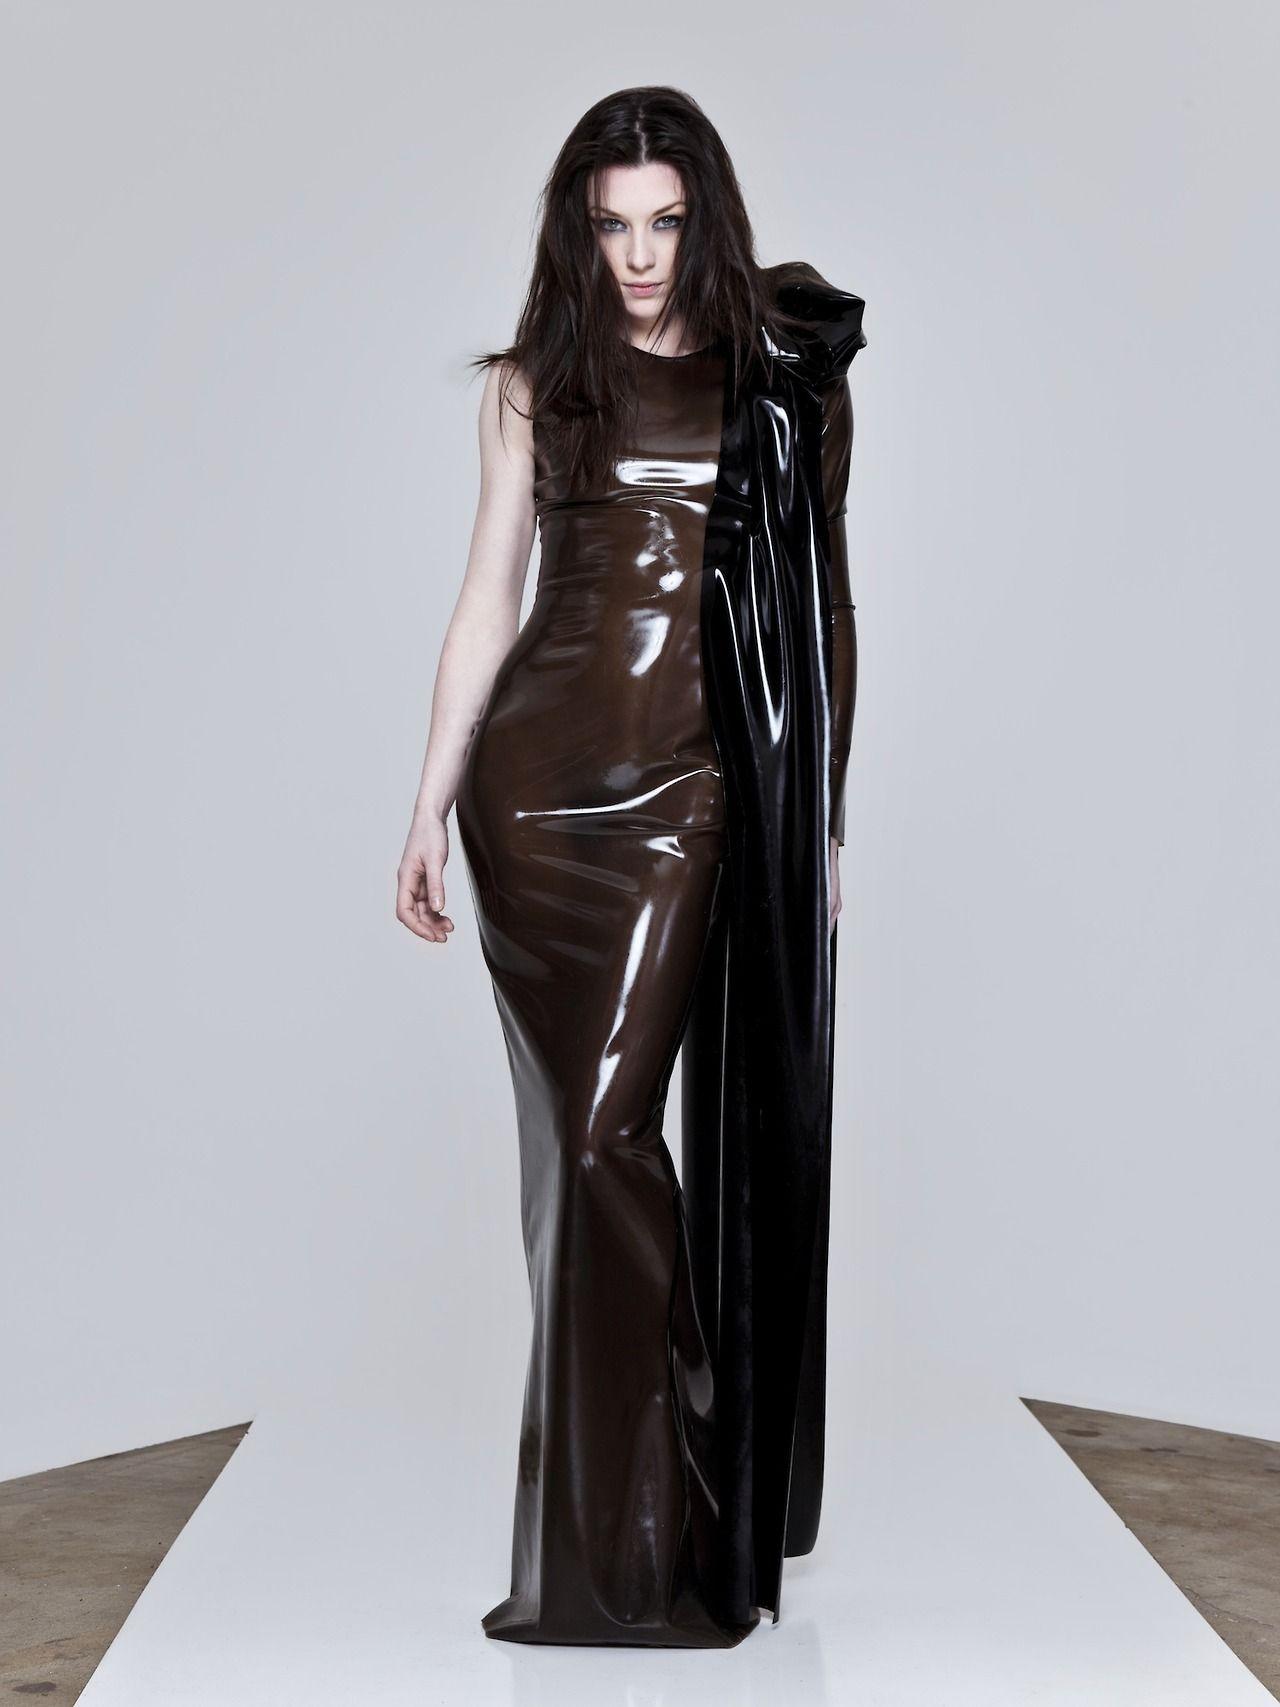 904a1137b9 Semi transparent long Latex dress  stoya  stoyadoll  jessicastoyadinovich   pornostar  sexy